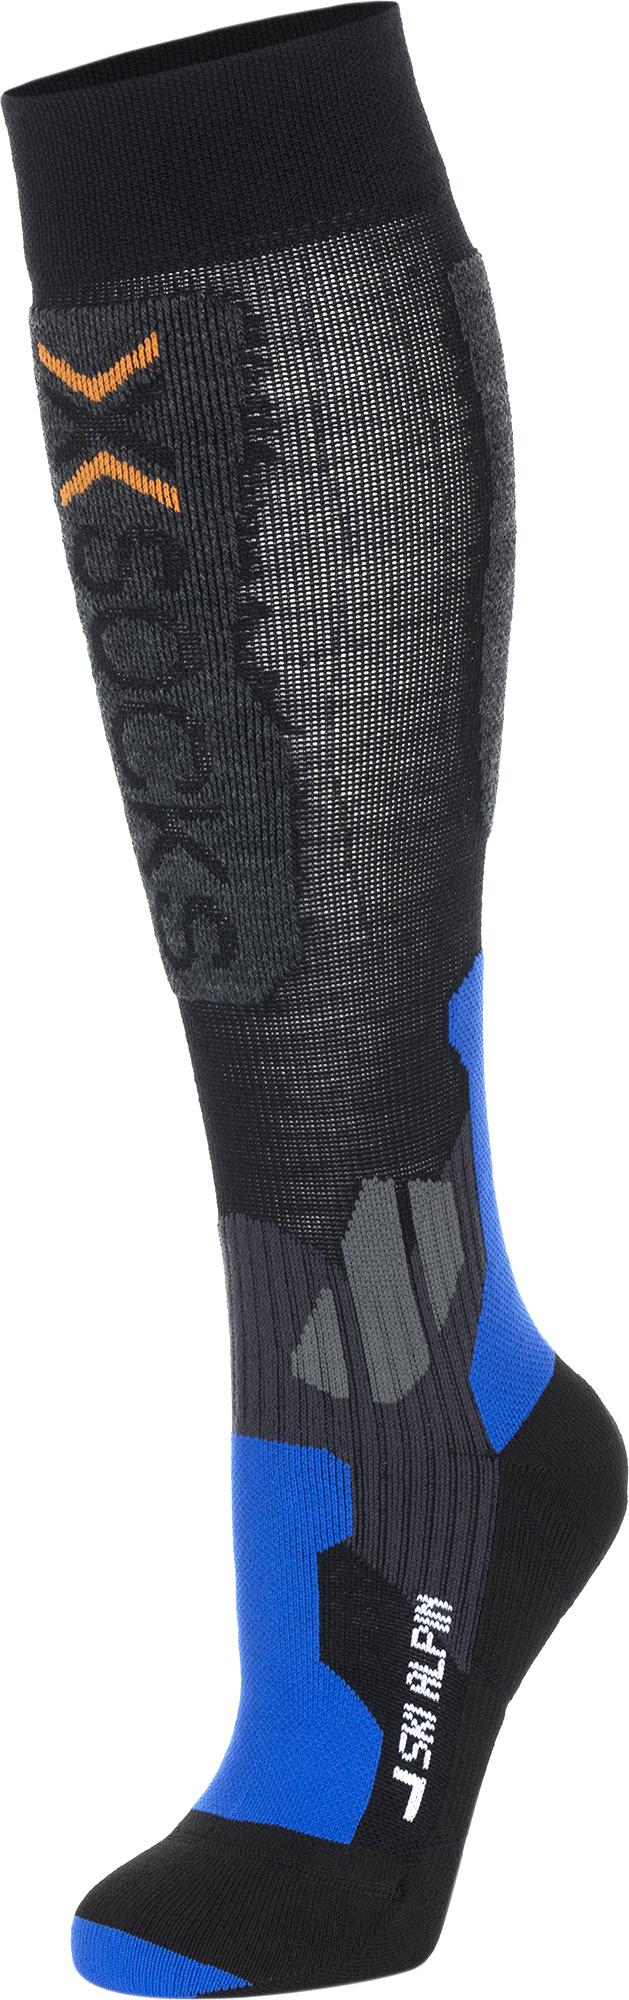 X-Socks Гольфы Ski Alpin, 1 пара, размер 45-47